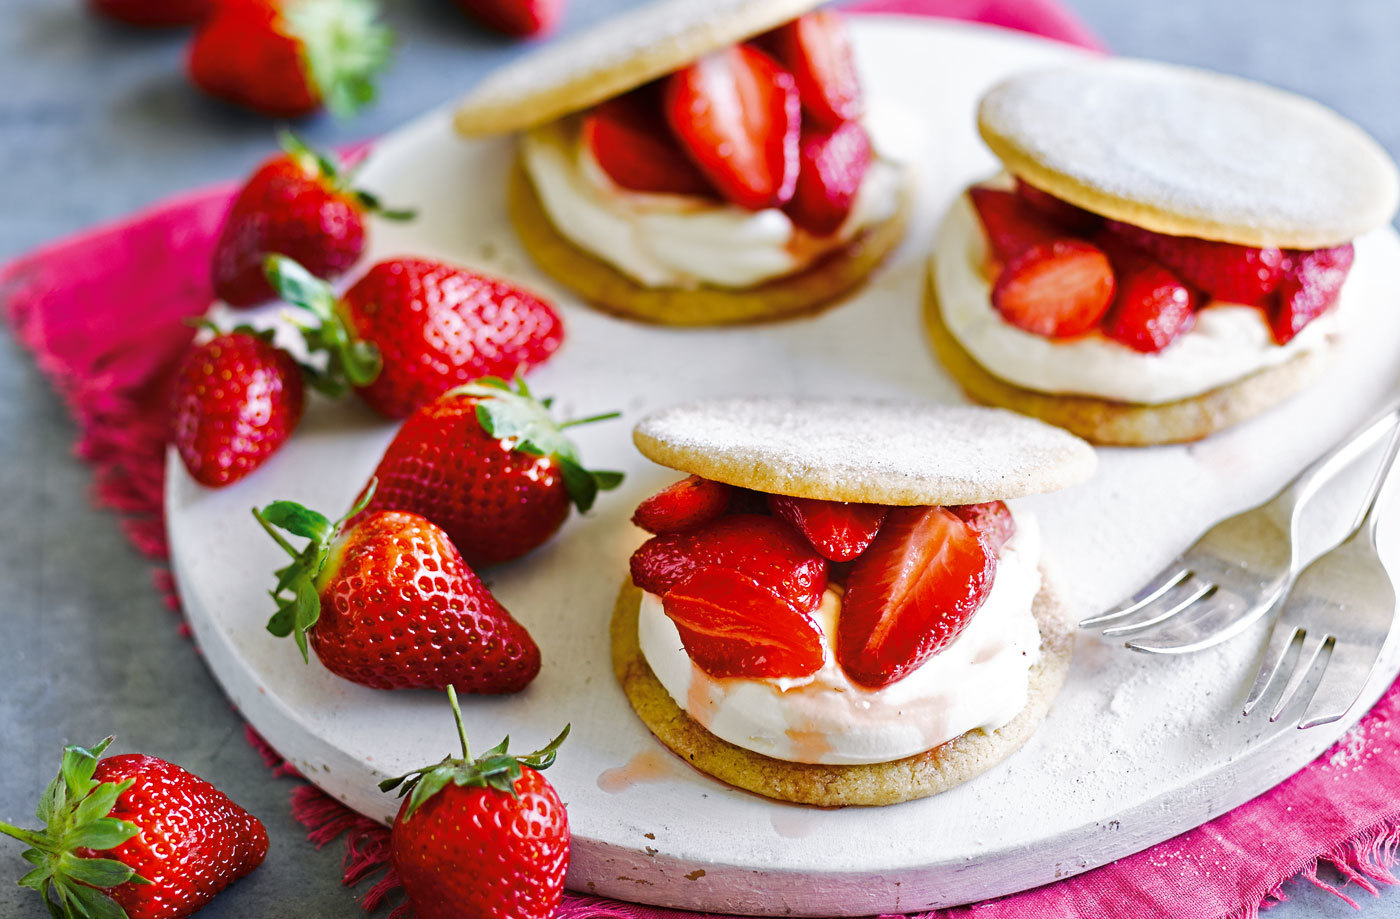 strawberry-cream-shortbread-LH-8ef6109a-63f3-460d-a1e7-78f7d1cf4715-0-1400x919.jpg